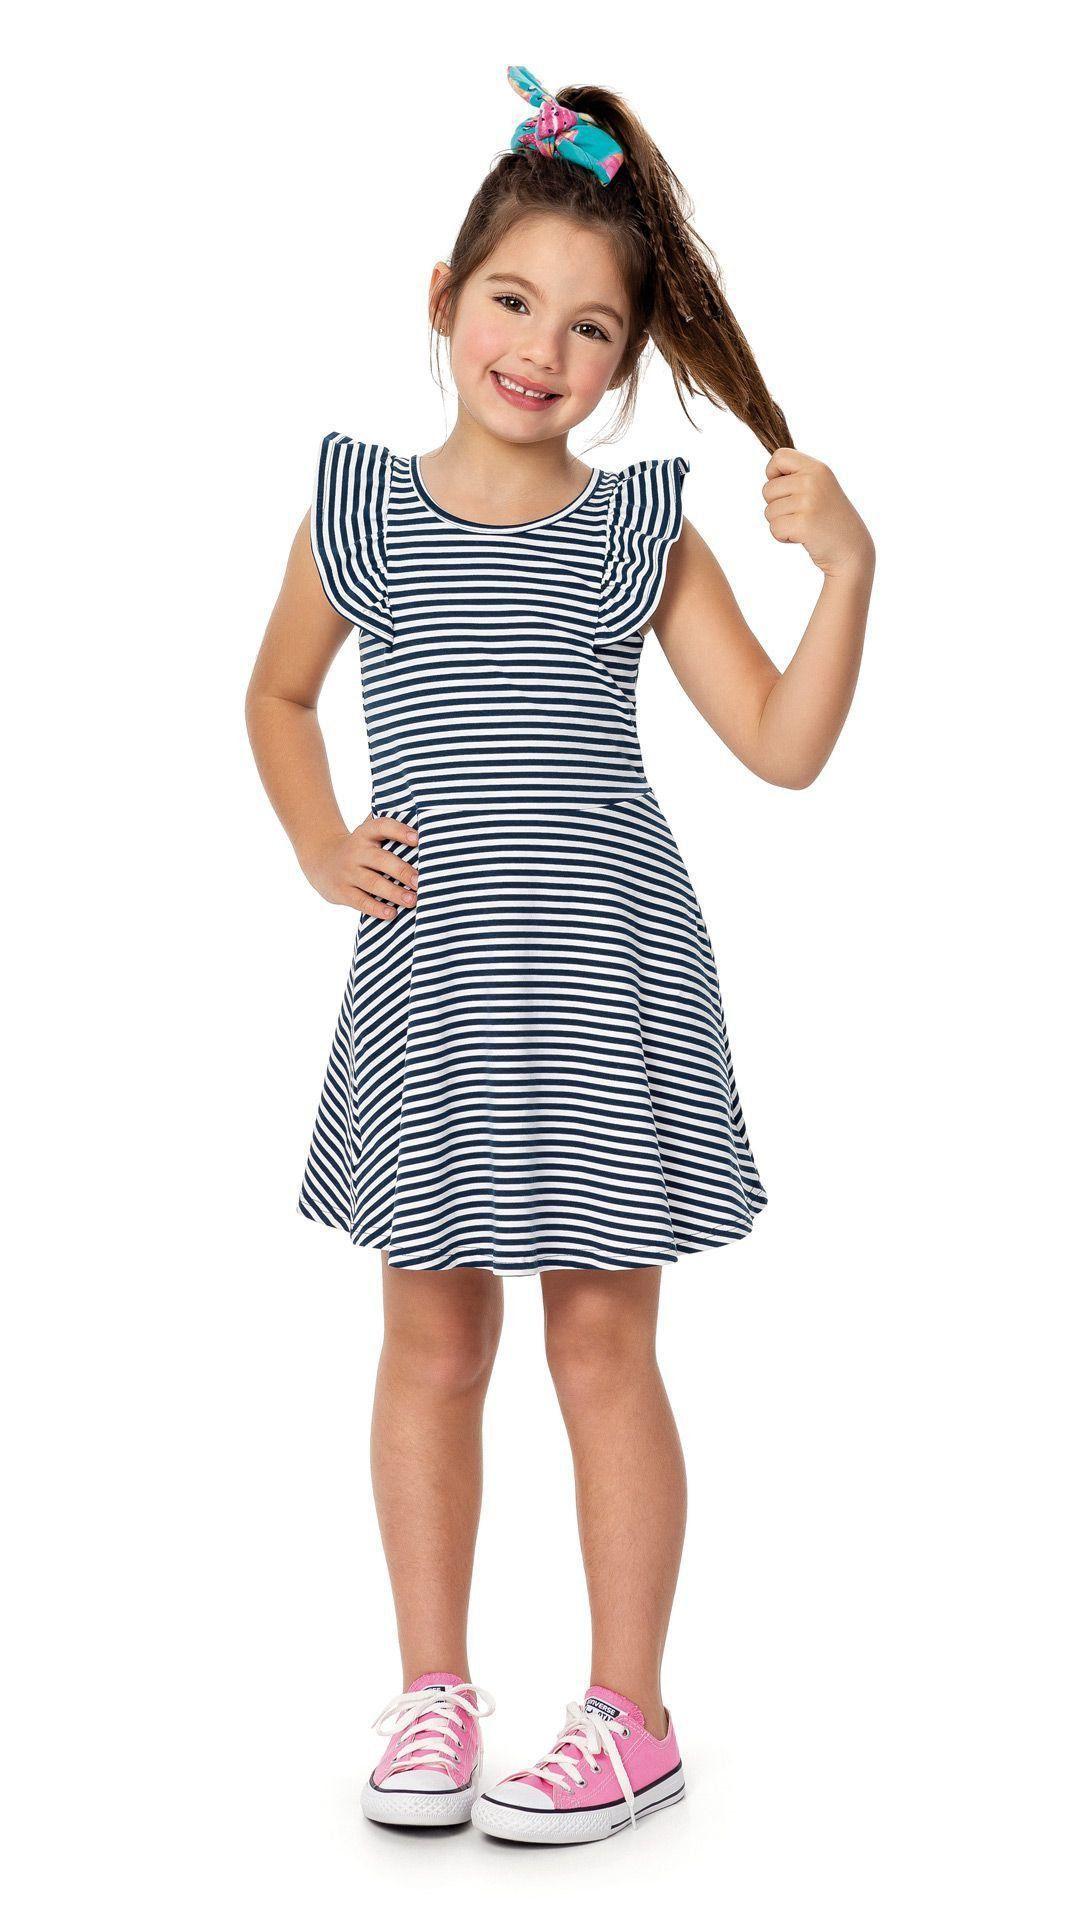 Vestido Infantil Azul Listrado Malwee